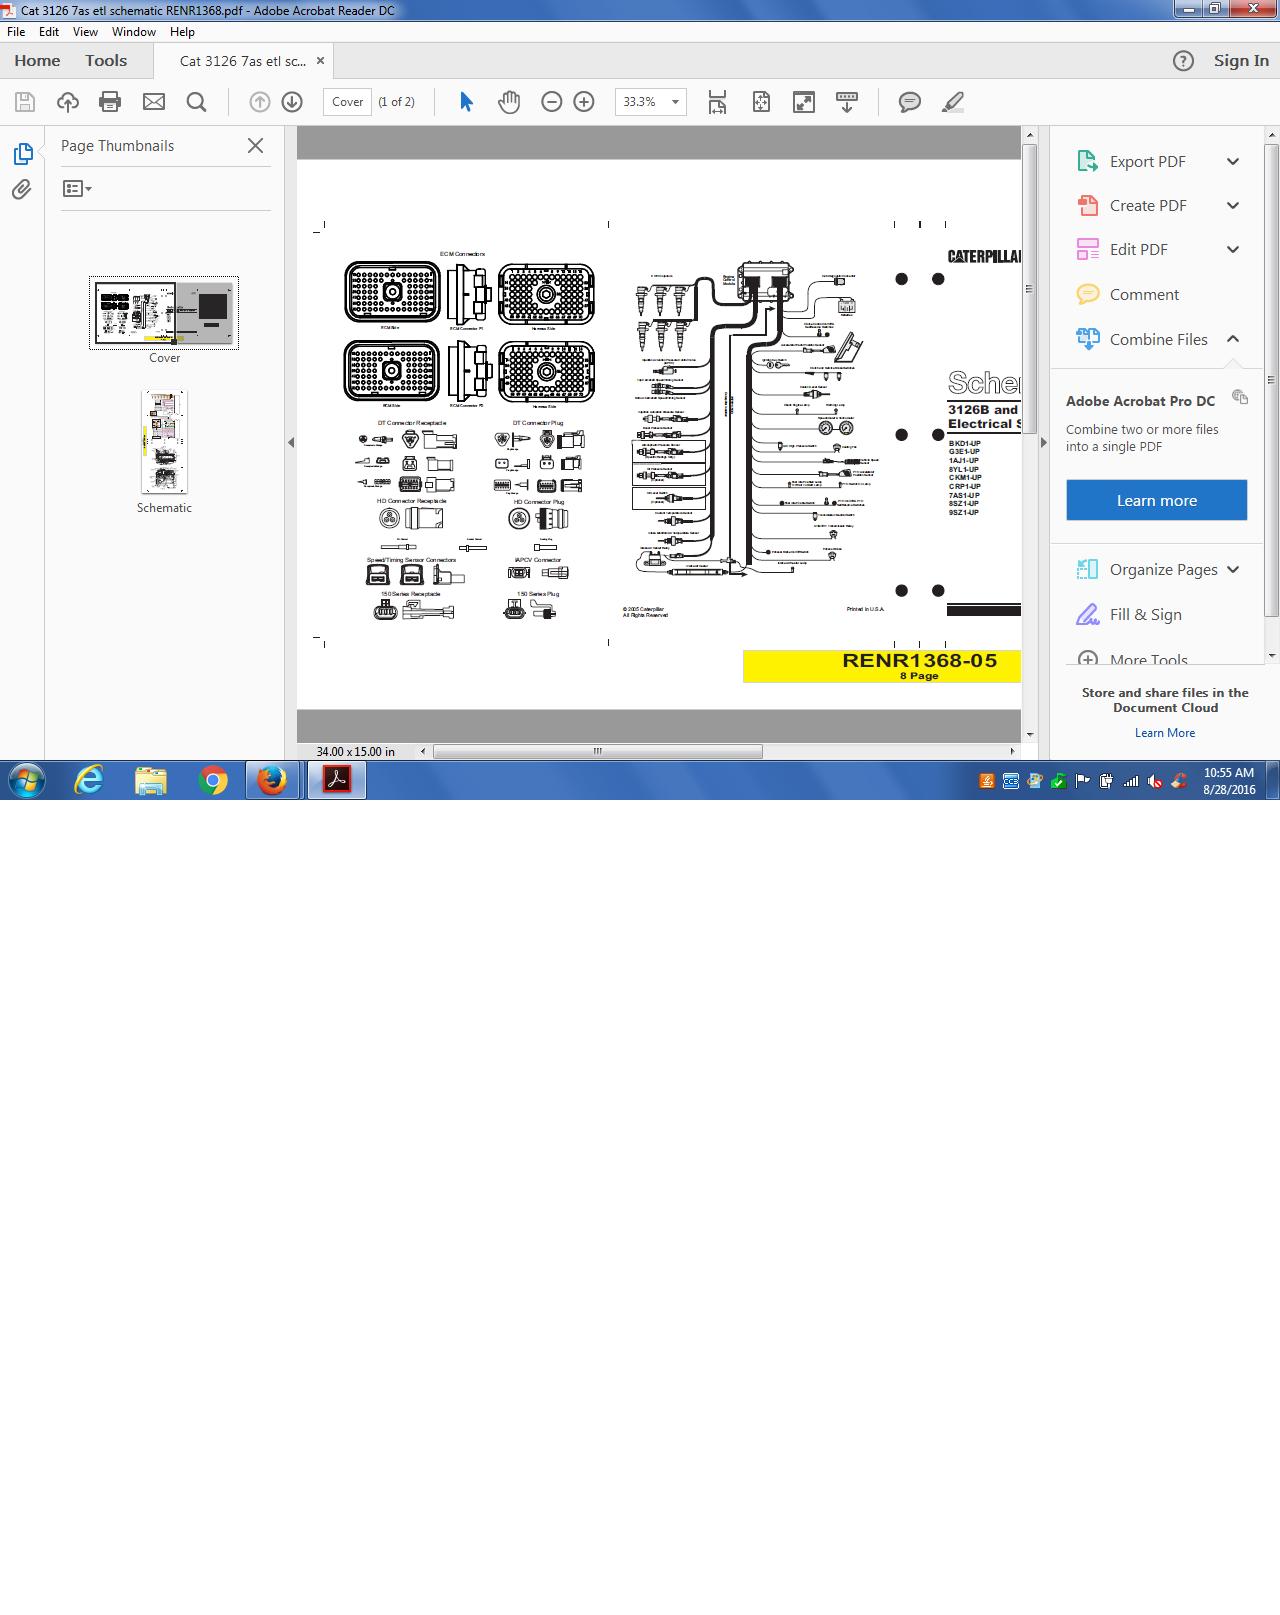 d0d4ee85-feae-40d6-afc3-0018532f4e53_Schematic C7 enlarge.png